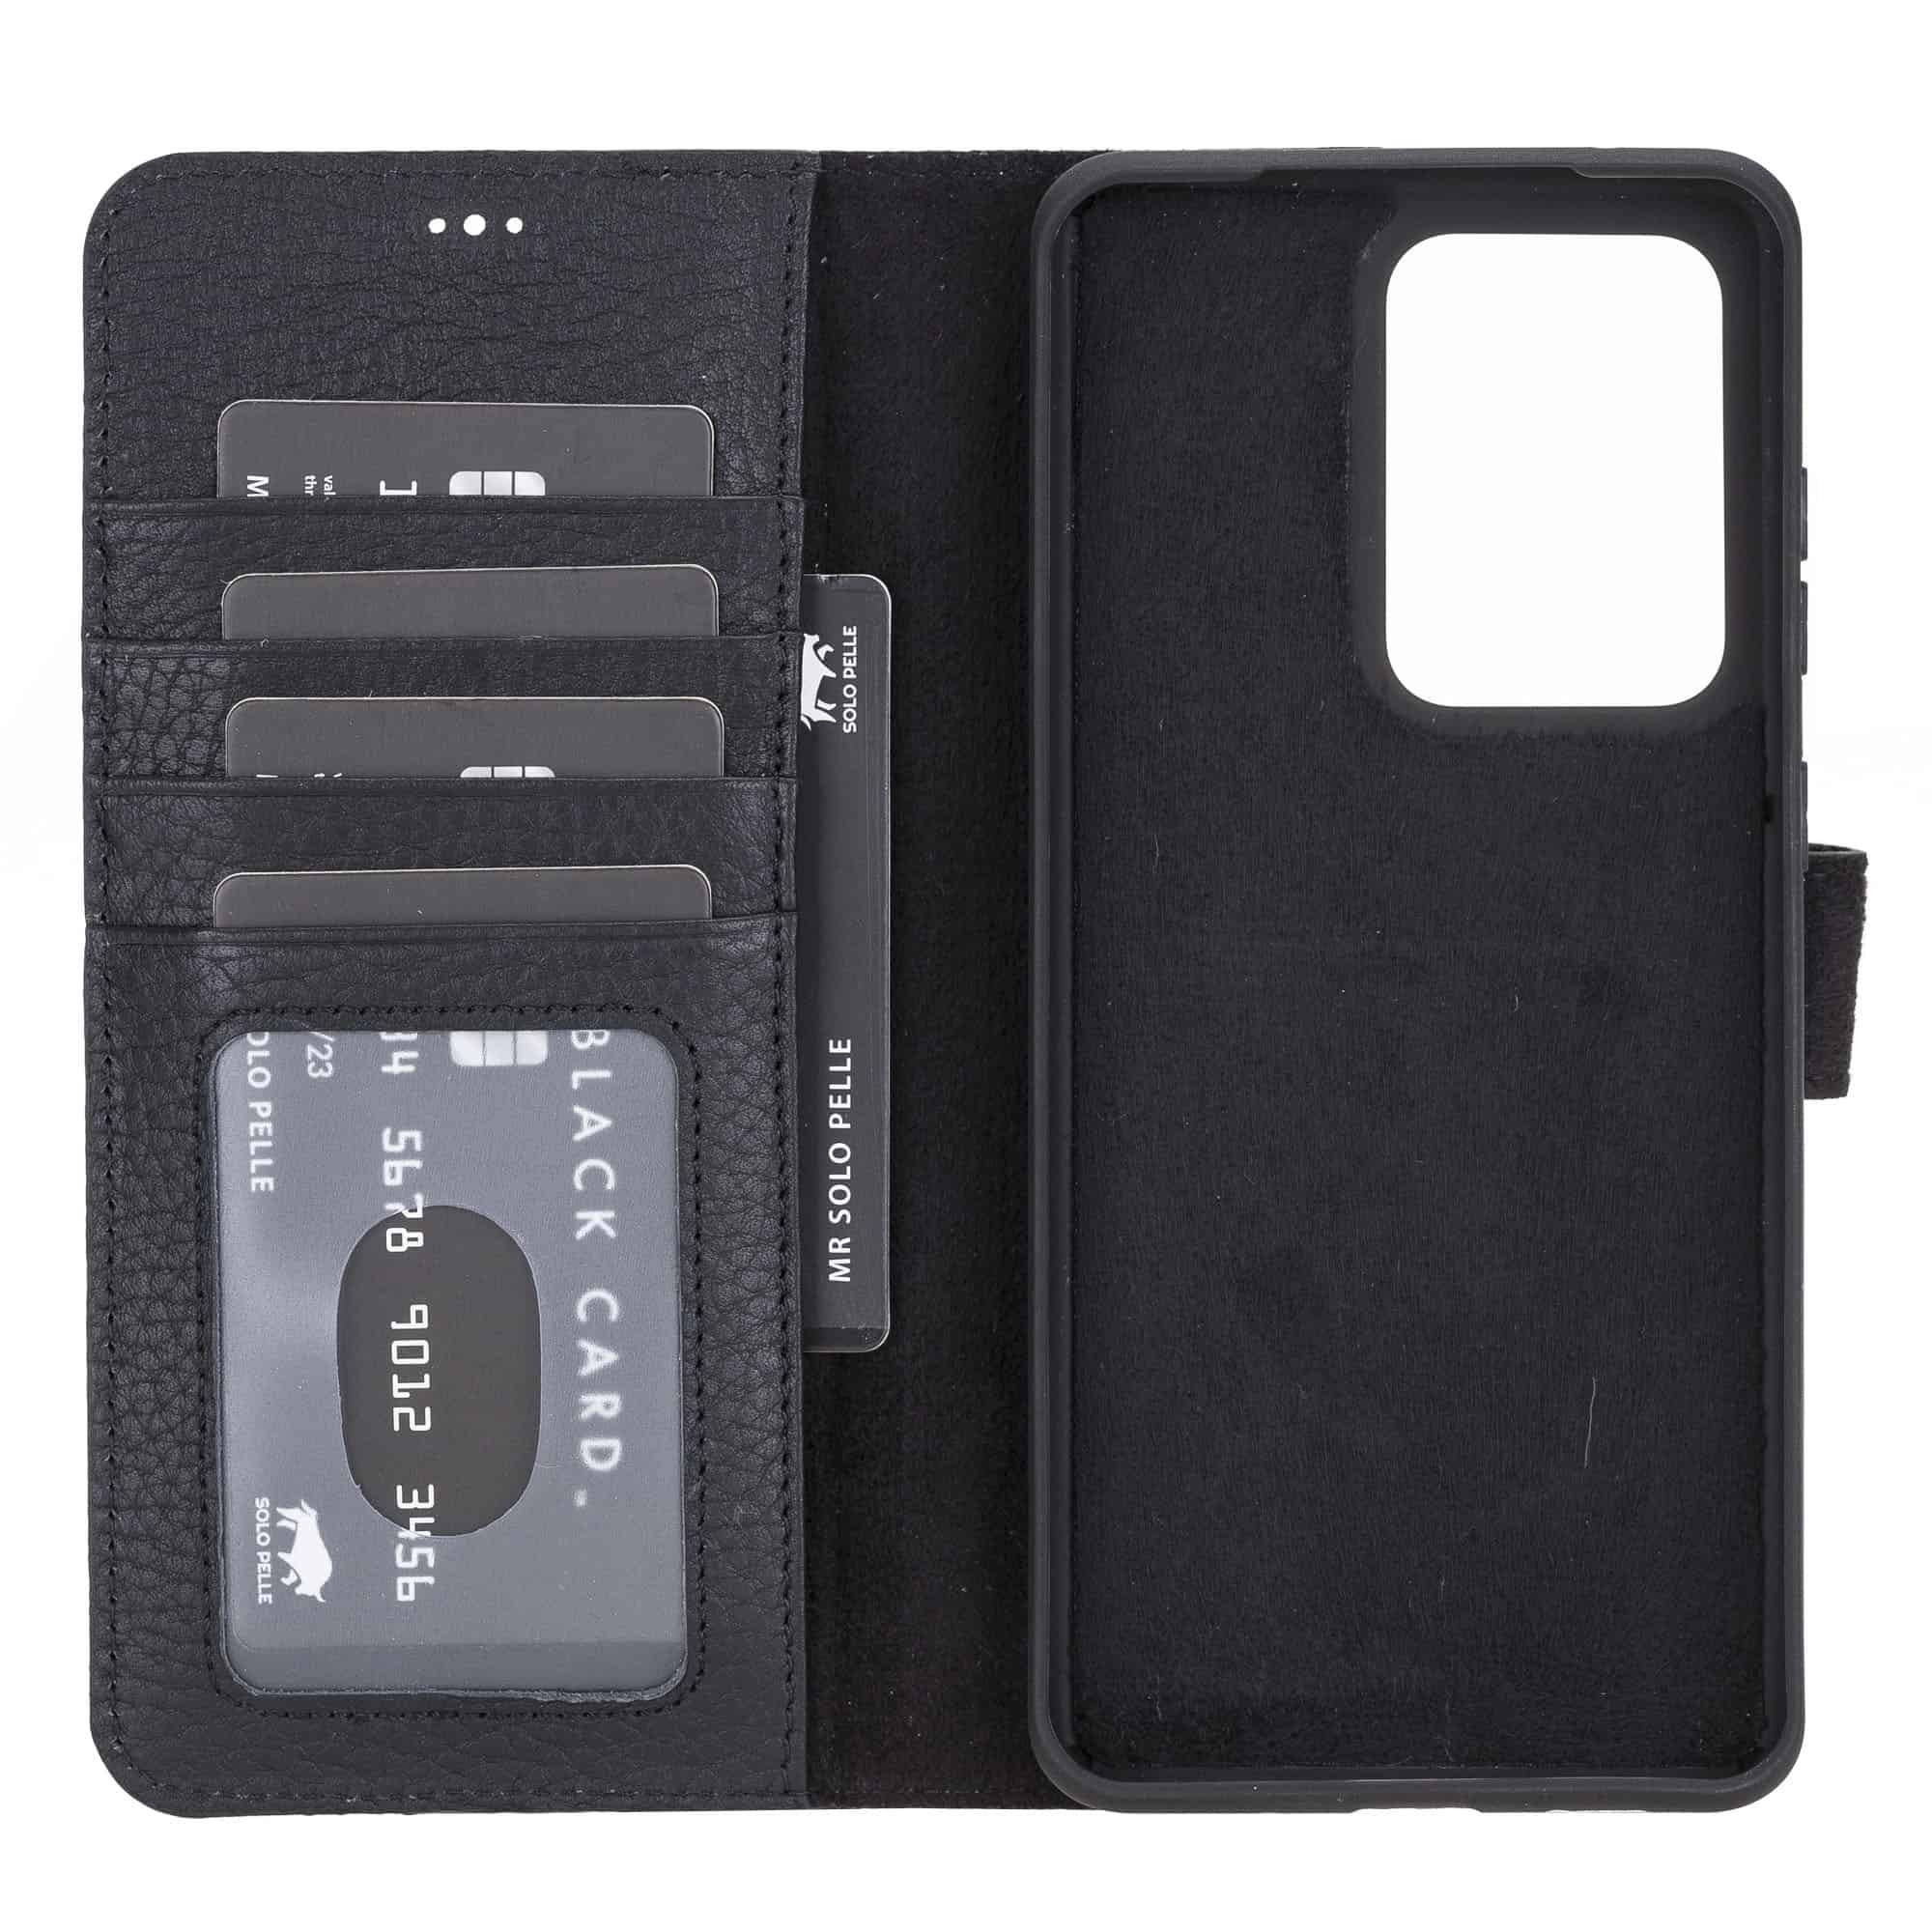 Solo Pelle Lederhülle Harvard kompatibel für das Samsung Galaxy Note 20 Ultra inklusive abnehmbare Hülle mit integrierten Kartenfächer (Matt Schwarz)